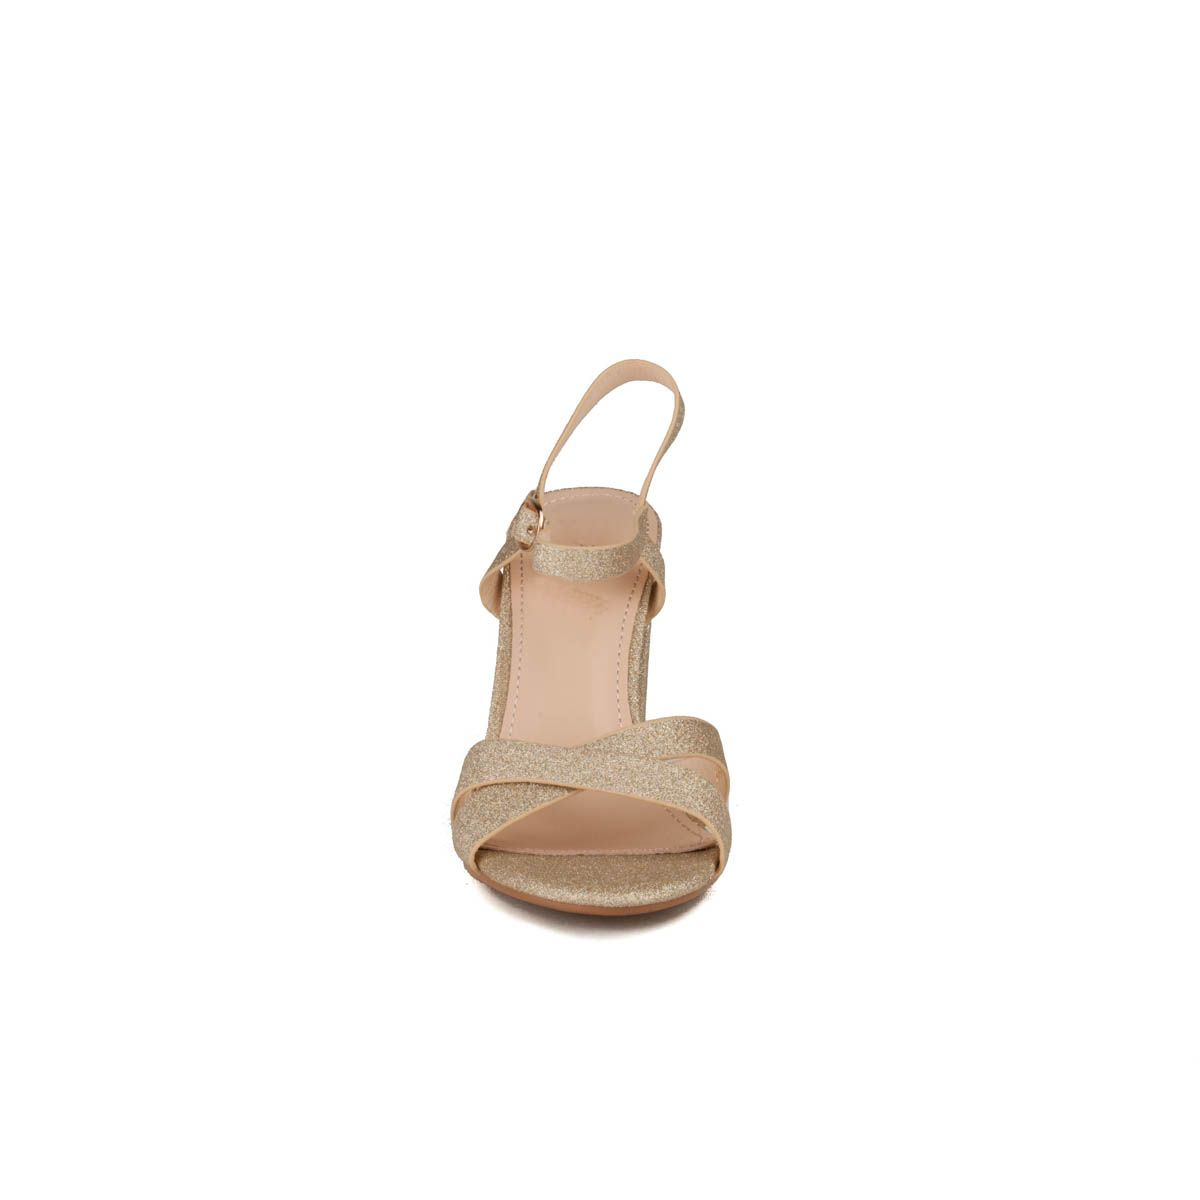 Montevita Block Heel Sandal in Gold